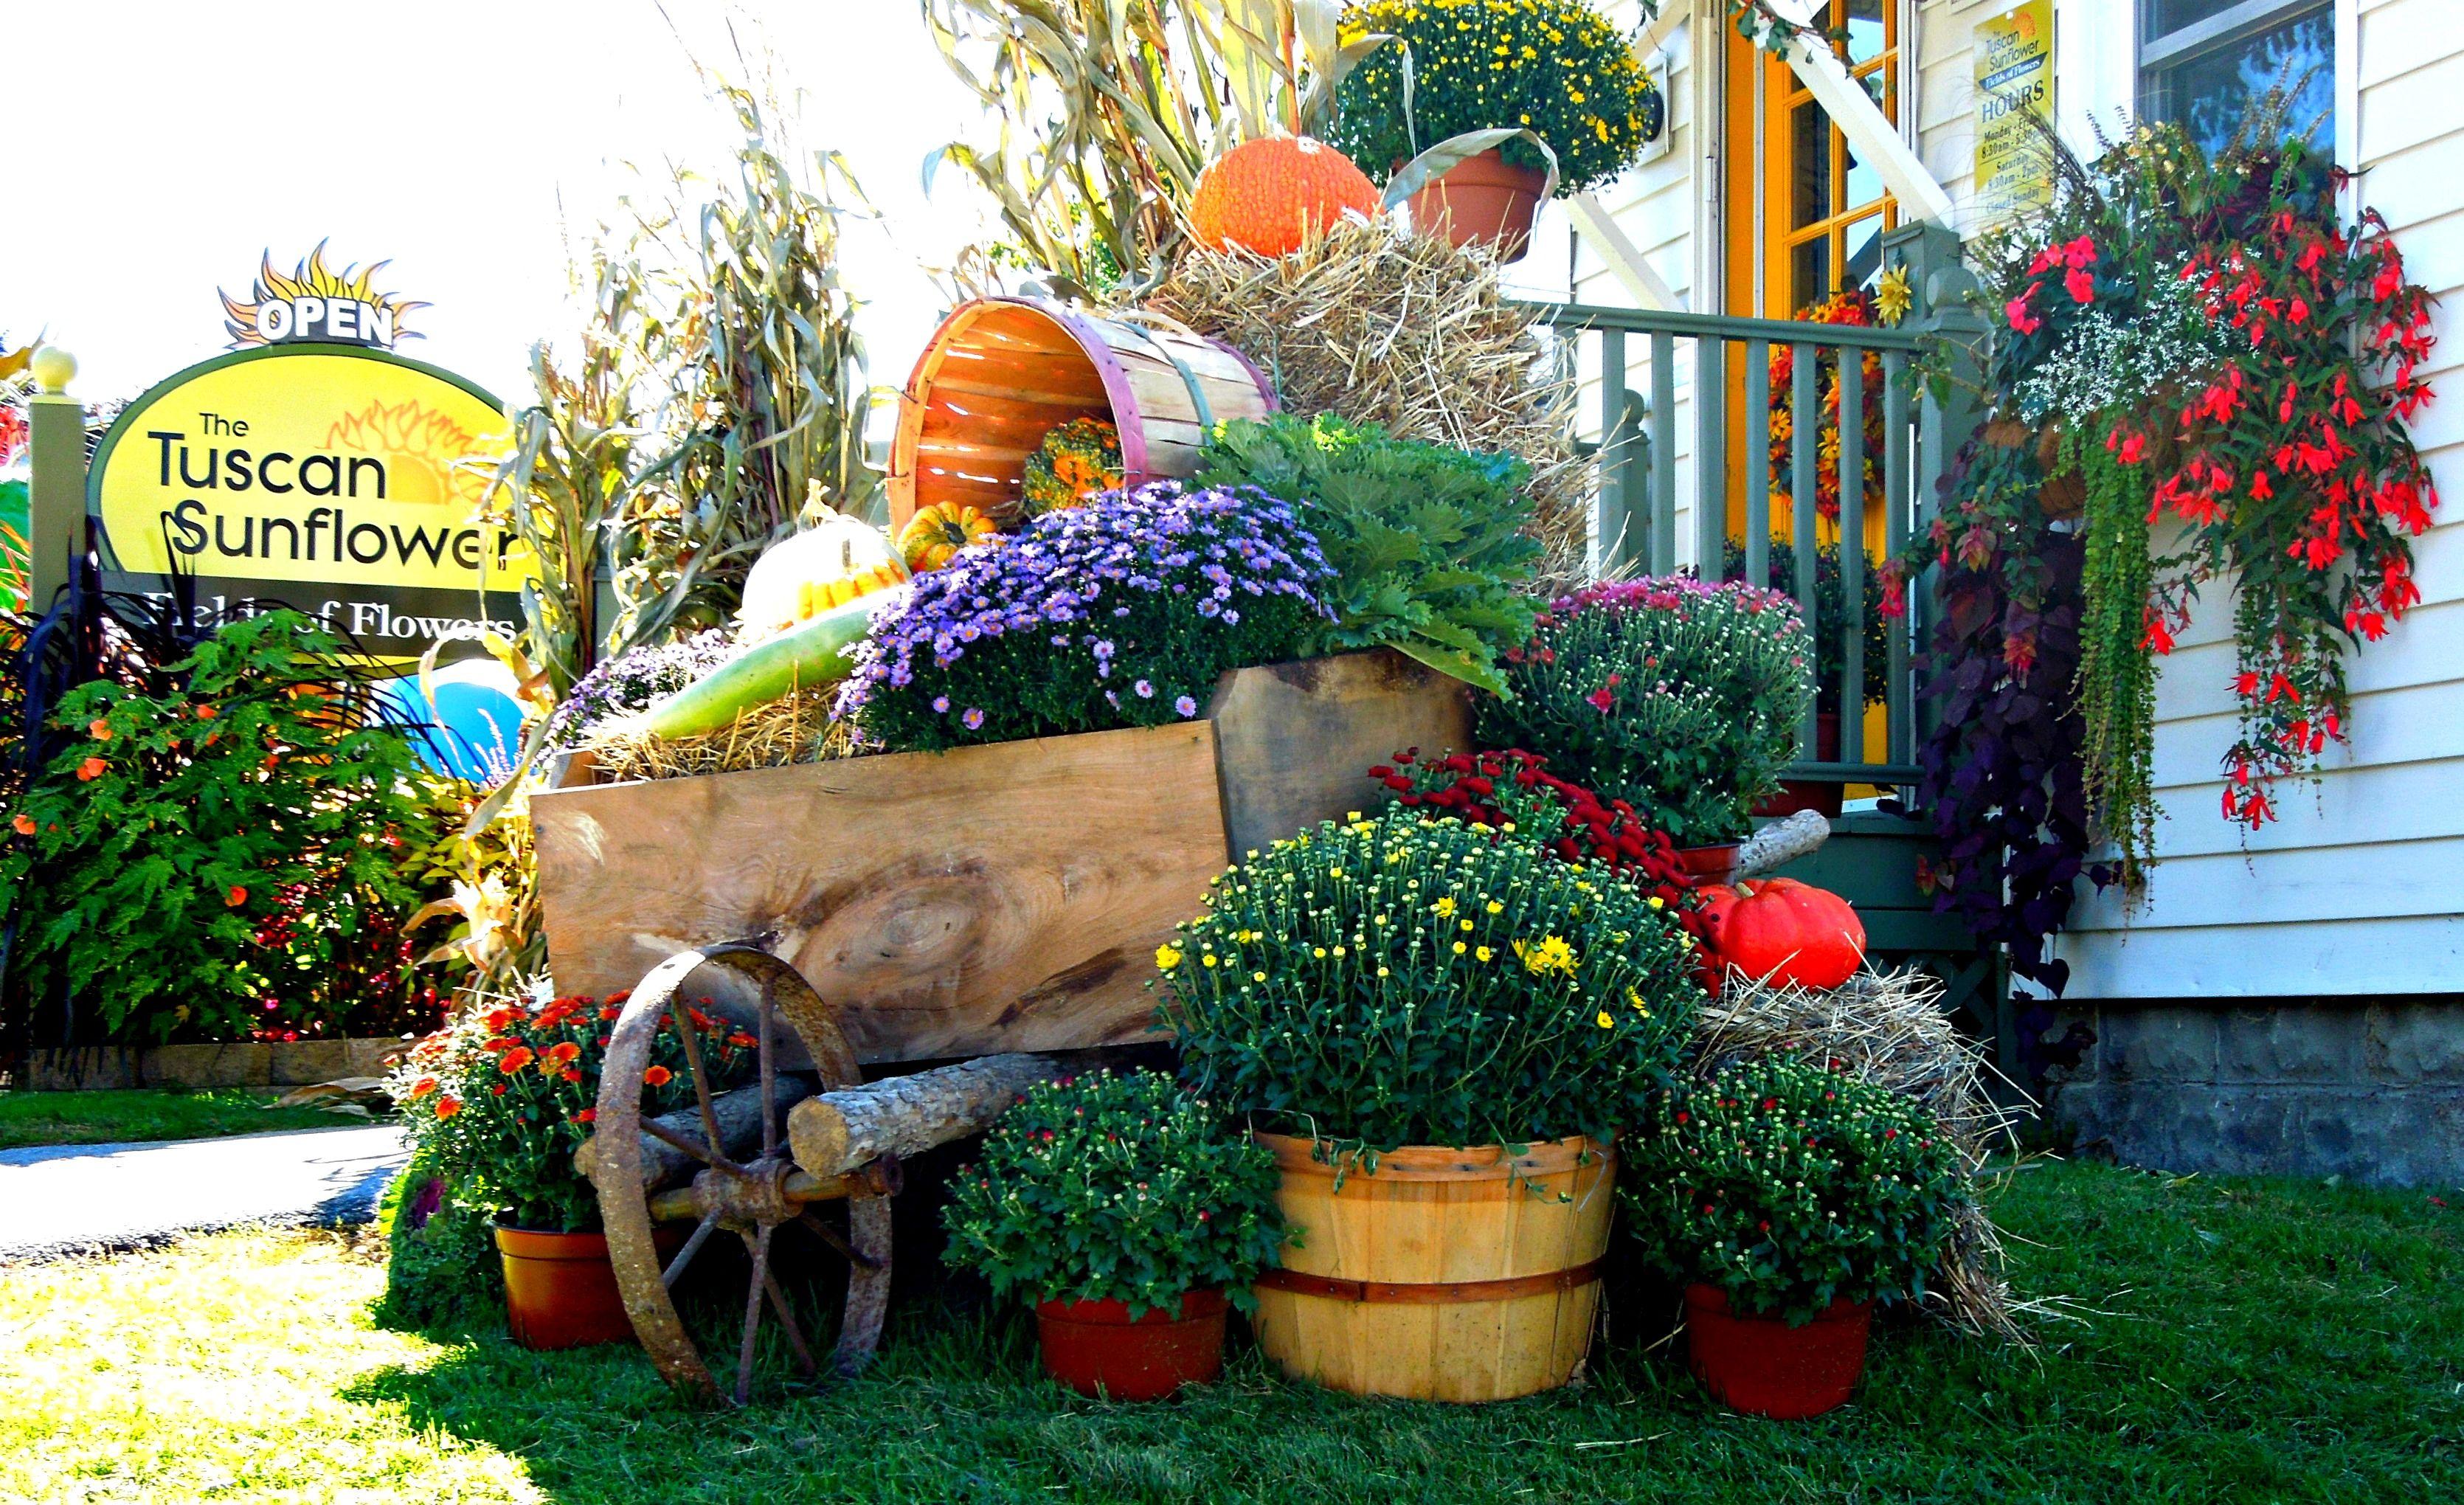 The Glorious colors of Autumn at The Tuscan Sunflower, Bennington, Vt